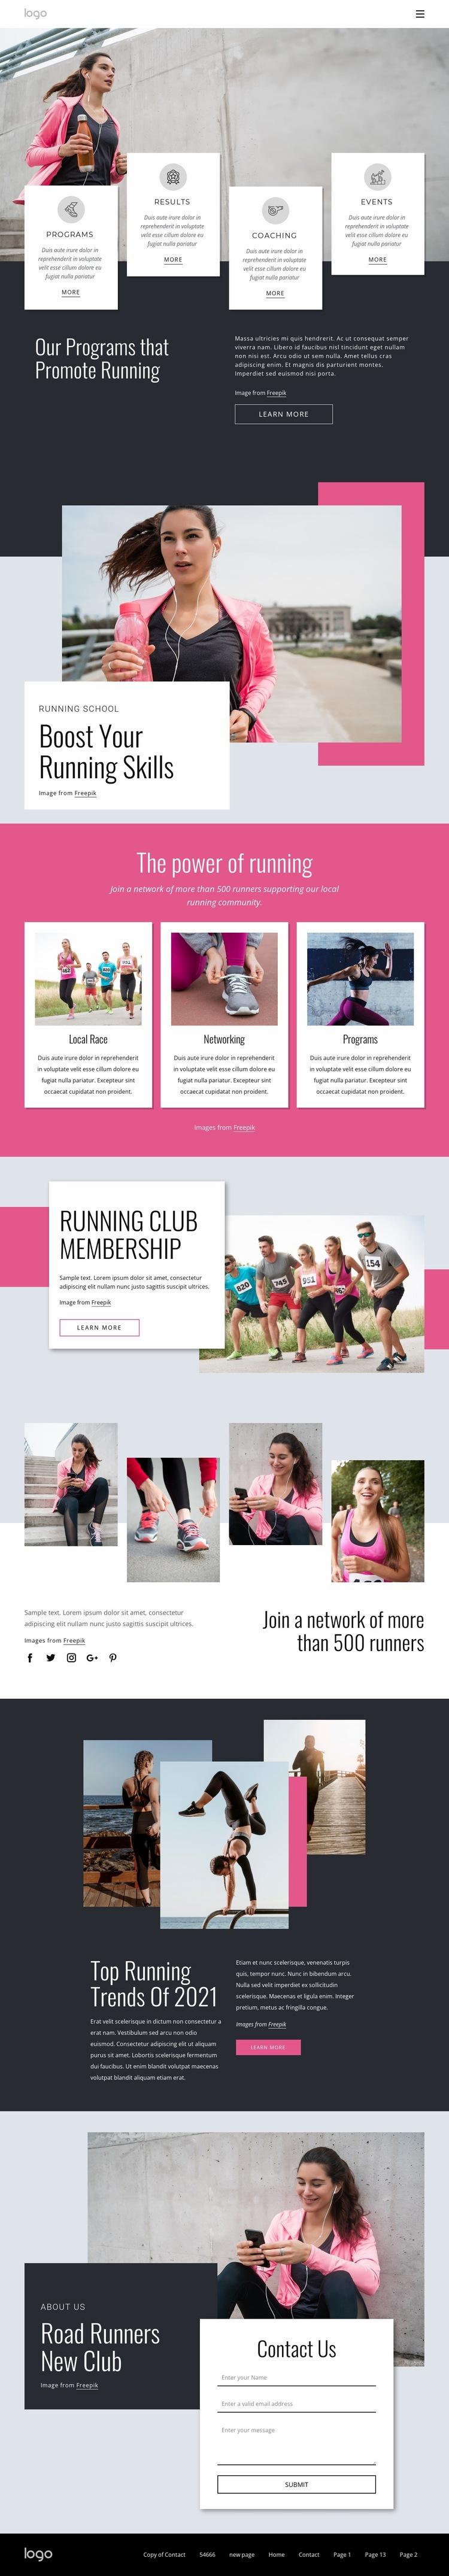 Running and walking community Html Code Example